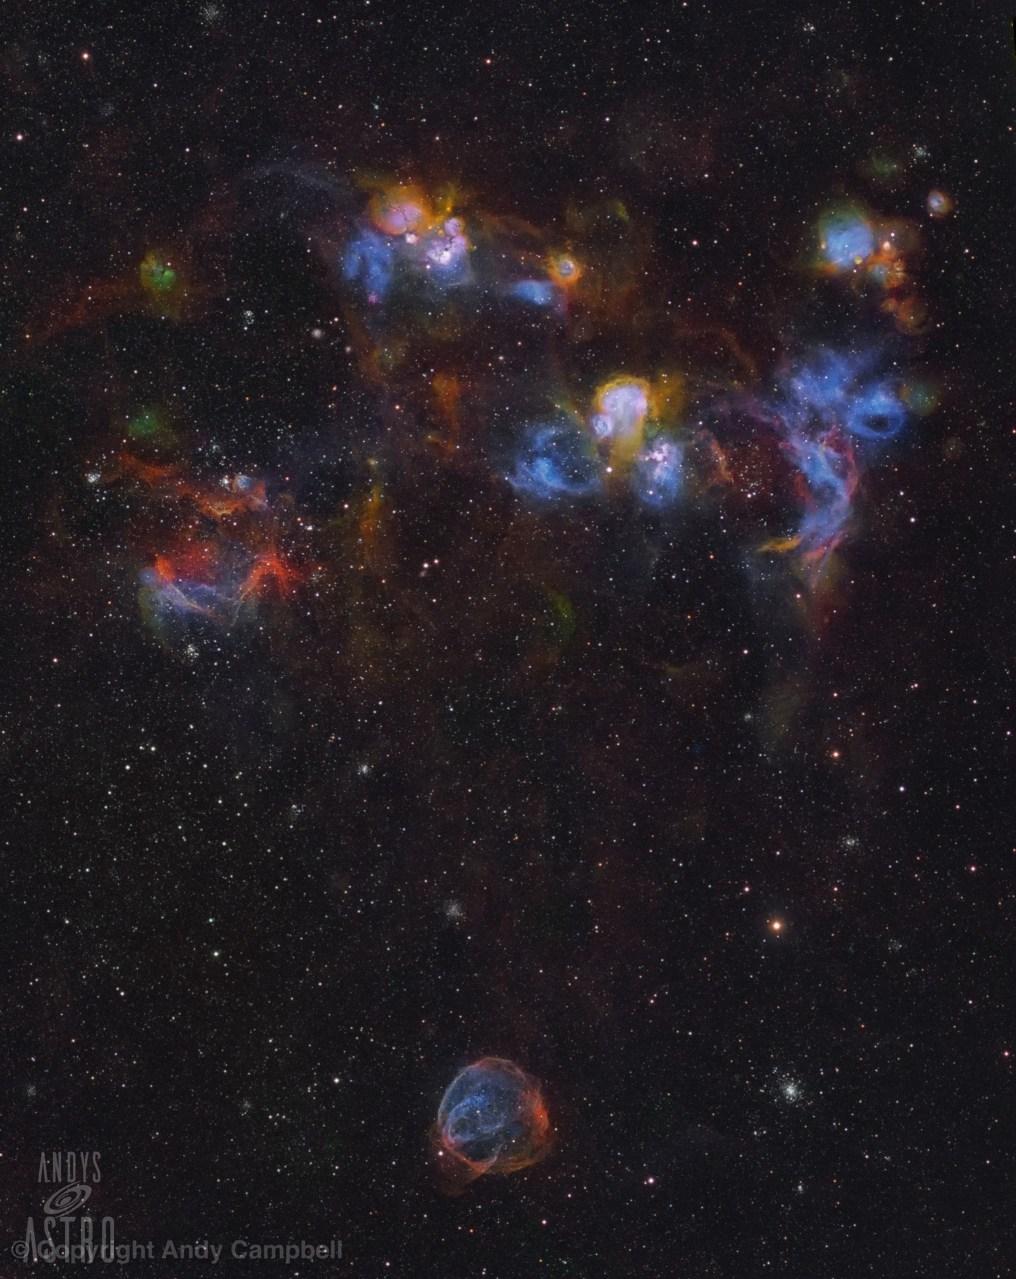 NGC 1772, NGC 1727 nebula in narrowband